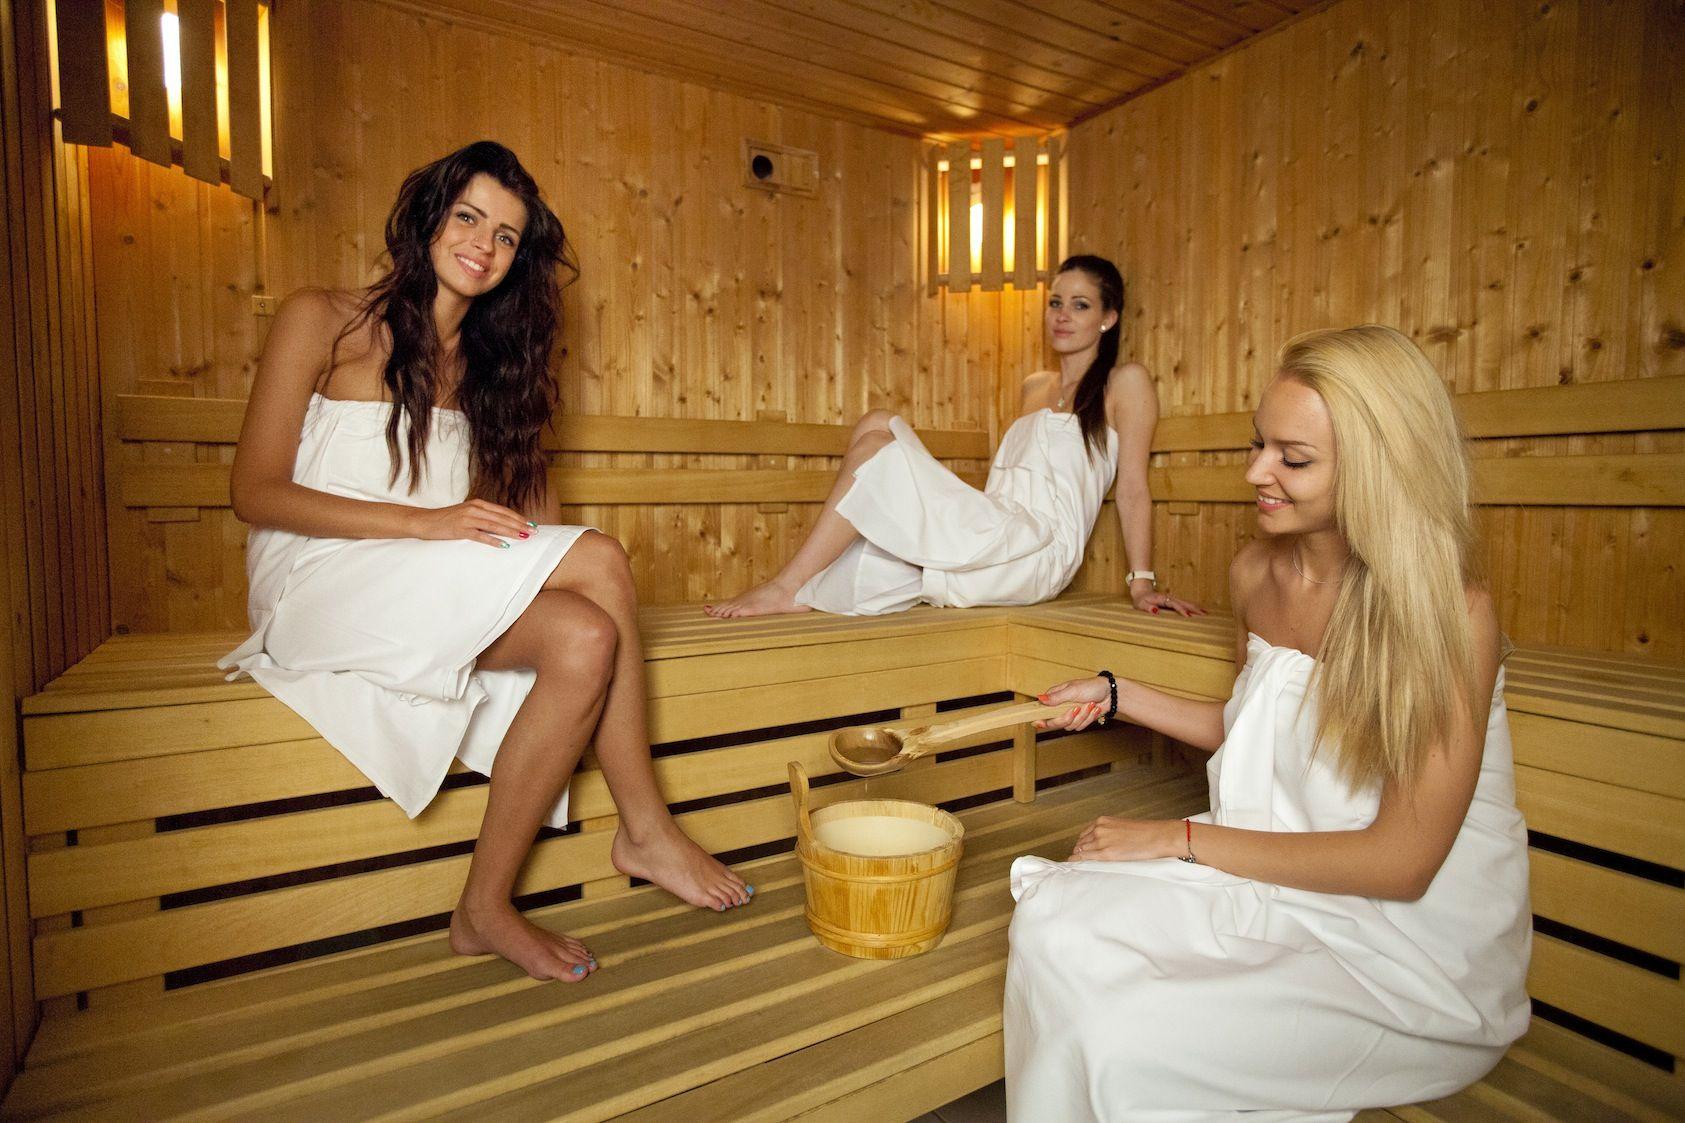 Сауна и девочки москва